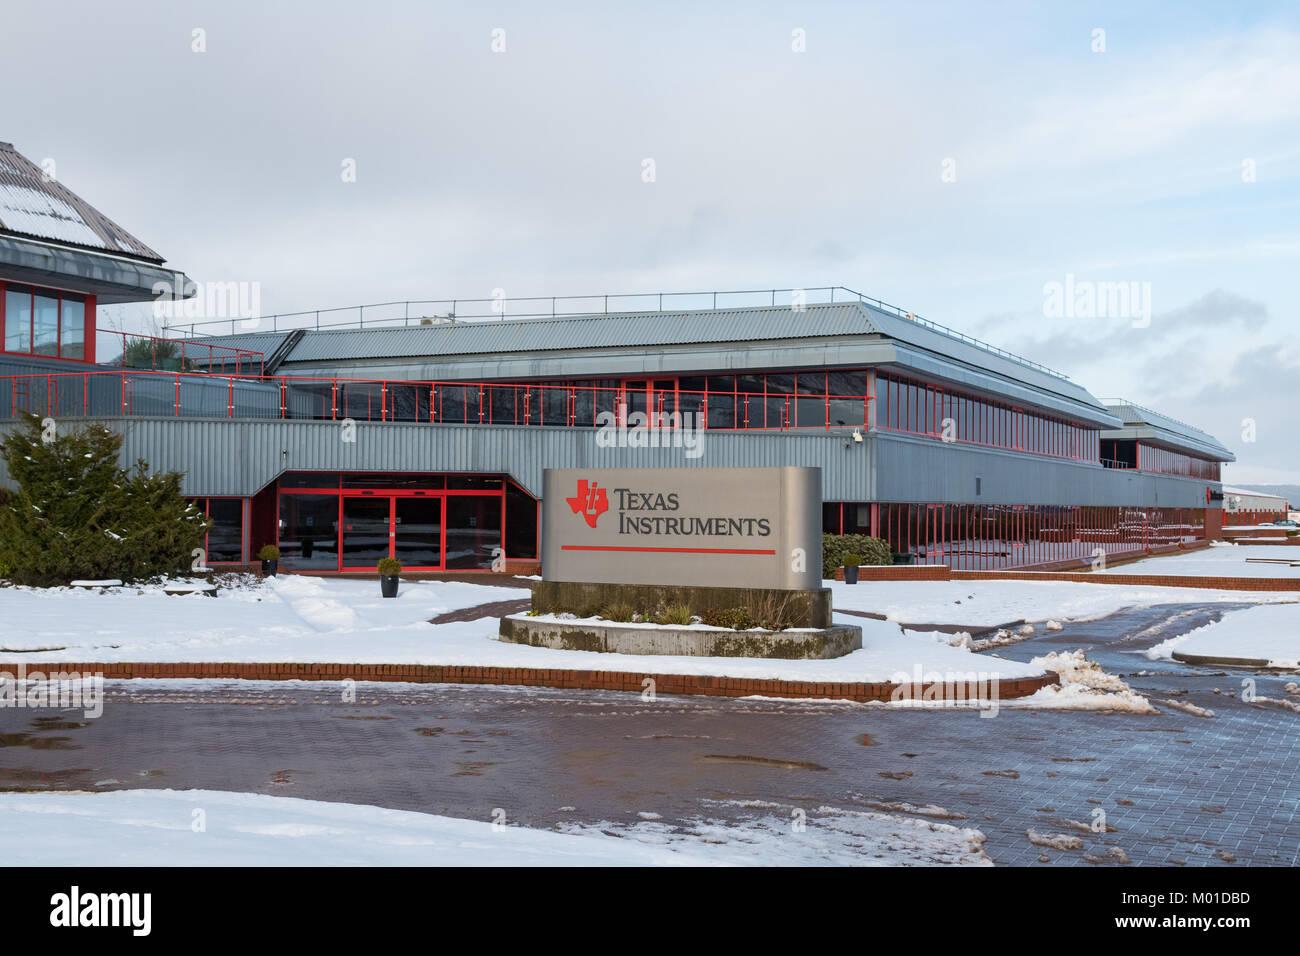 Texas Instruments semiconductor factory, Gourock, Greenock, Scotland, UK - Stock Image